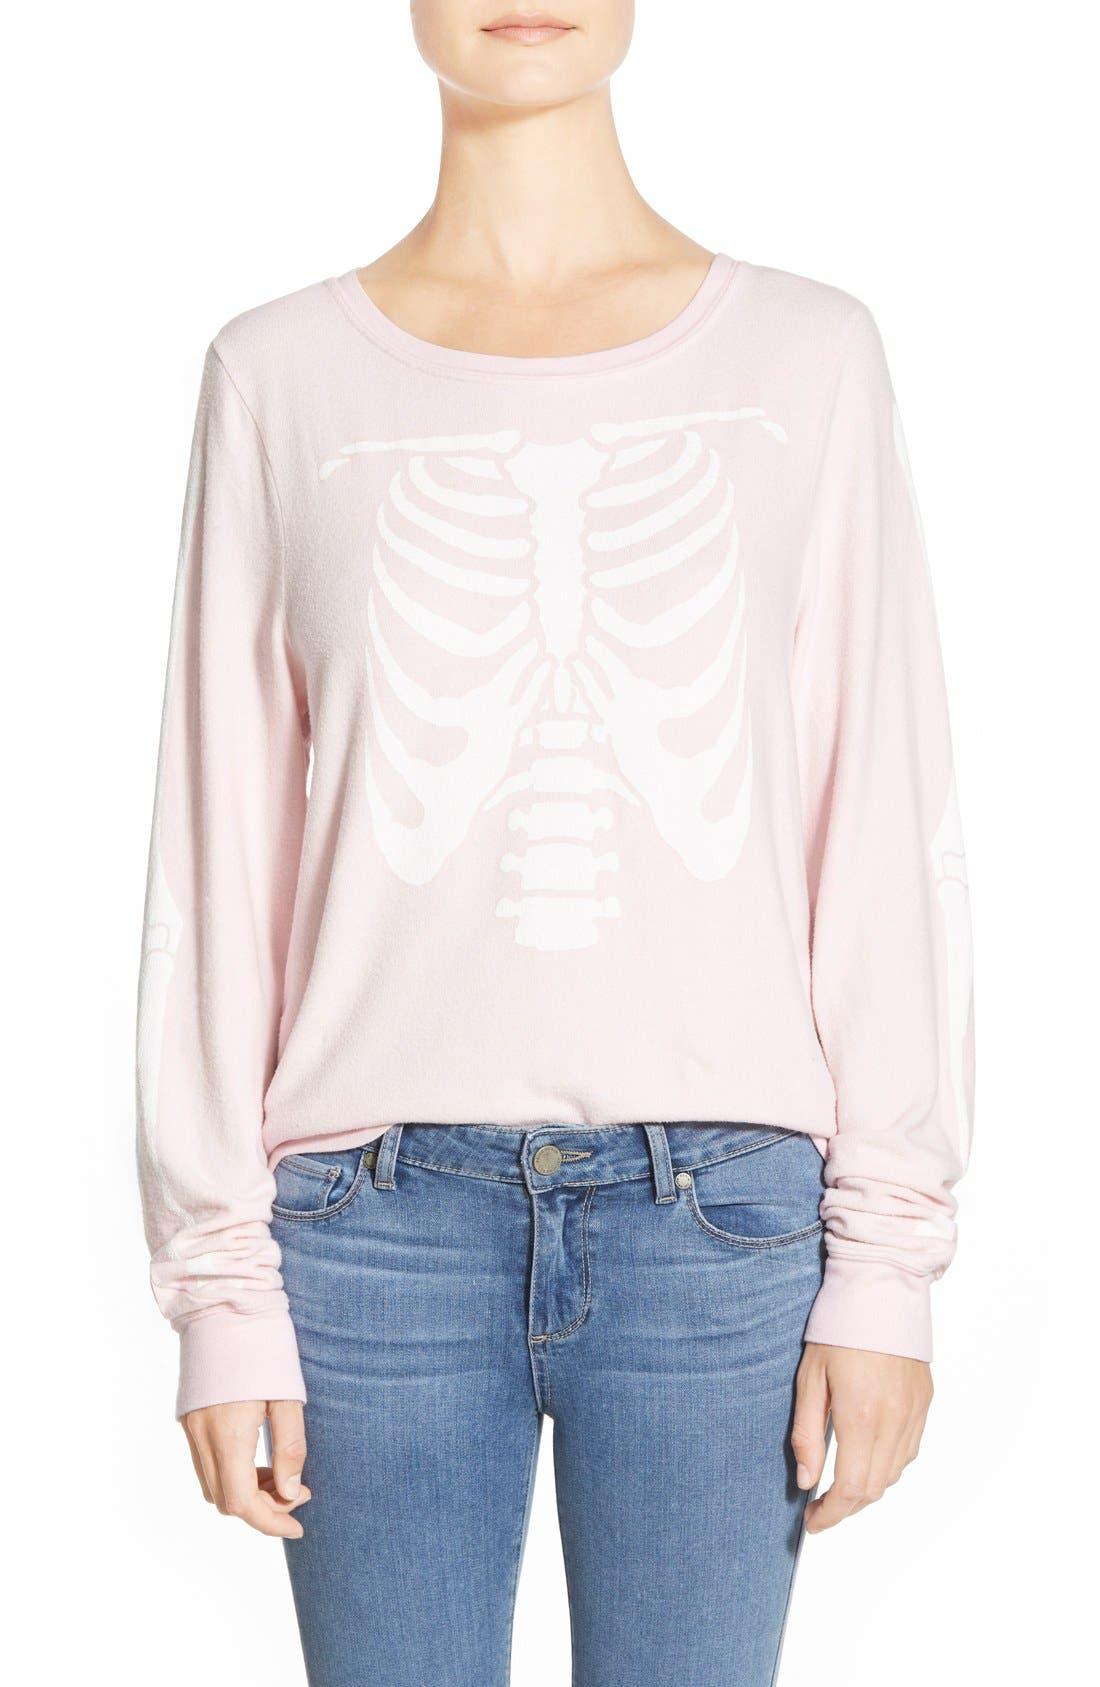 Main Image - Wildfox 'Inside Out' Long Sleeve Sweatshirt